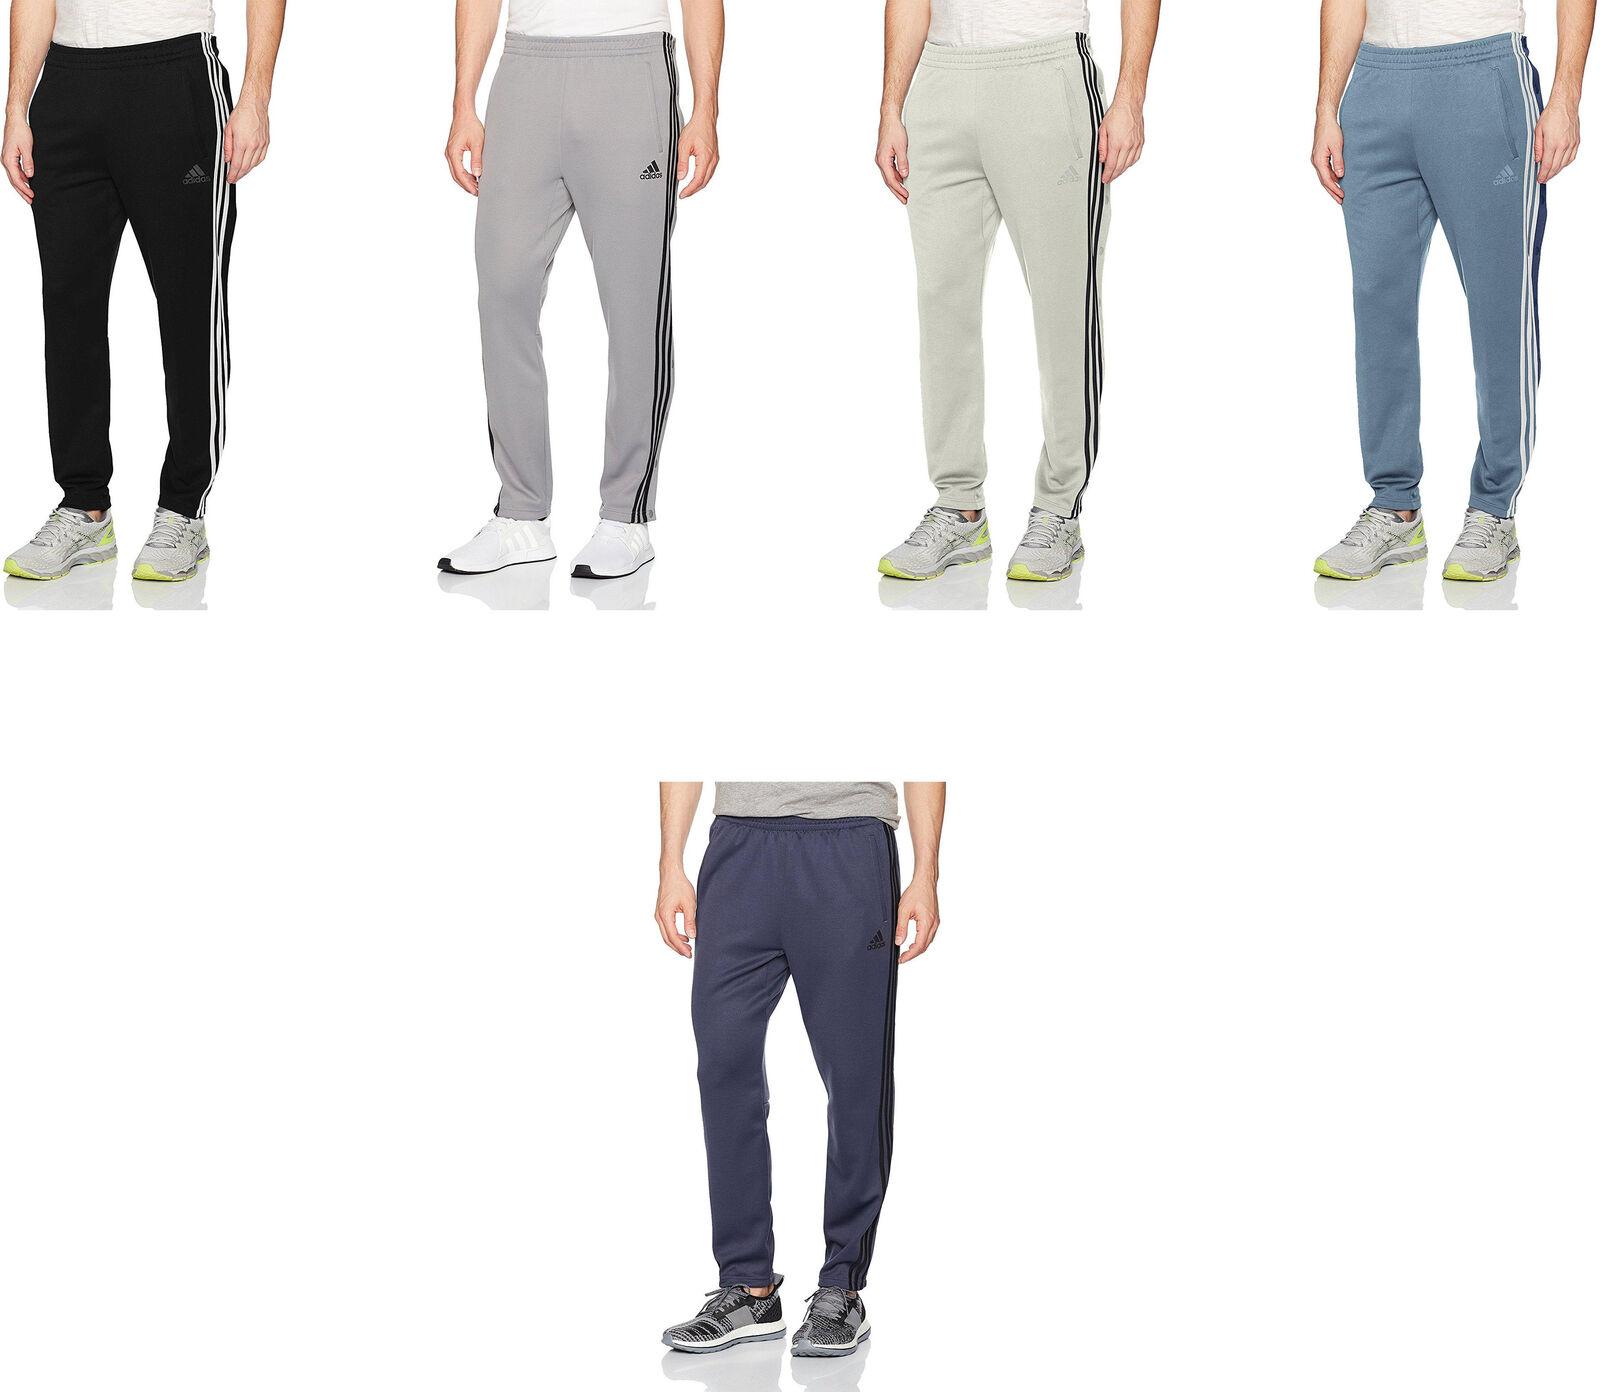 1a077a9ecc Details about adidas Men's Athletics Squad Id Snap Track Pants, 6 Colors